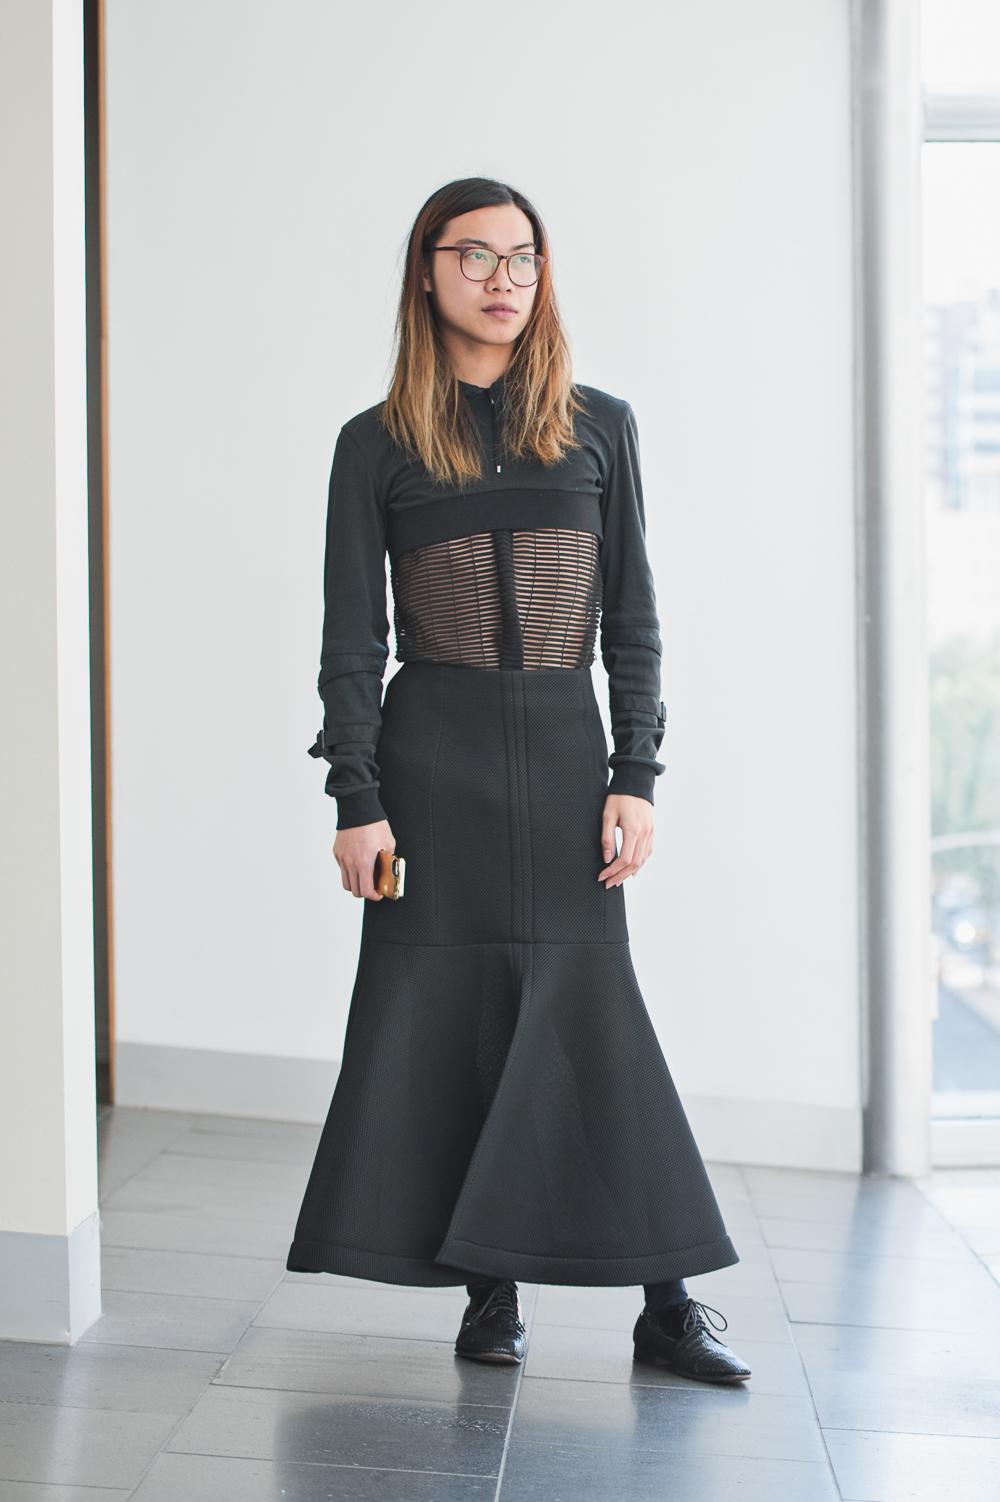 melbourne-street-style-kenzo-skirt